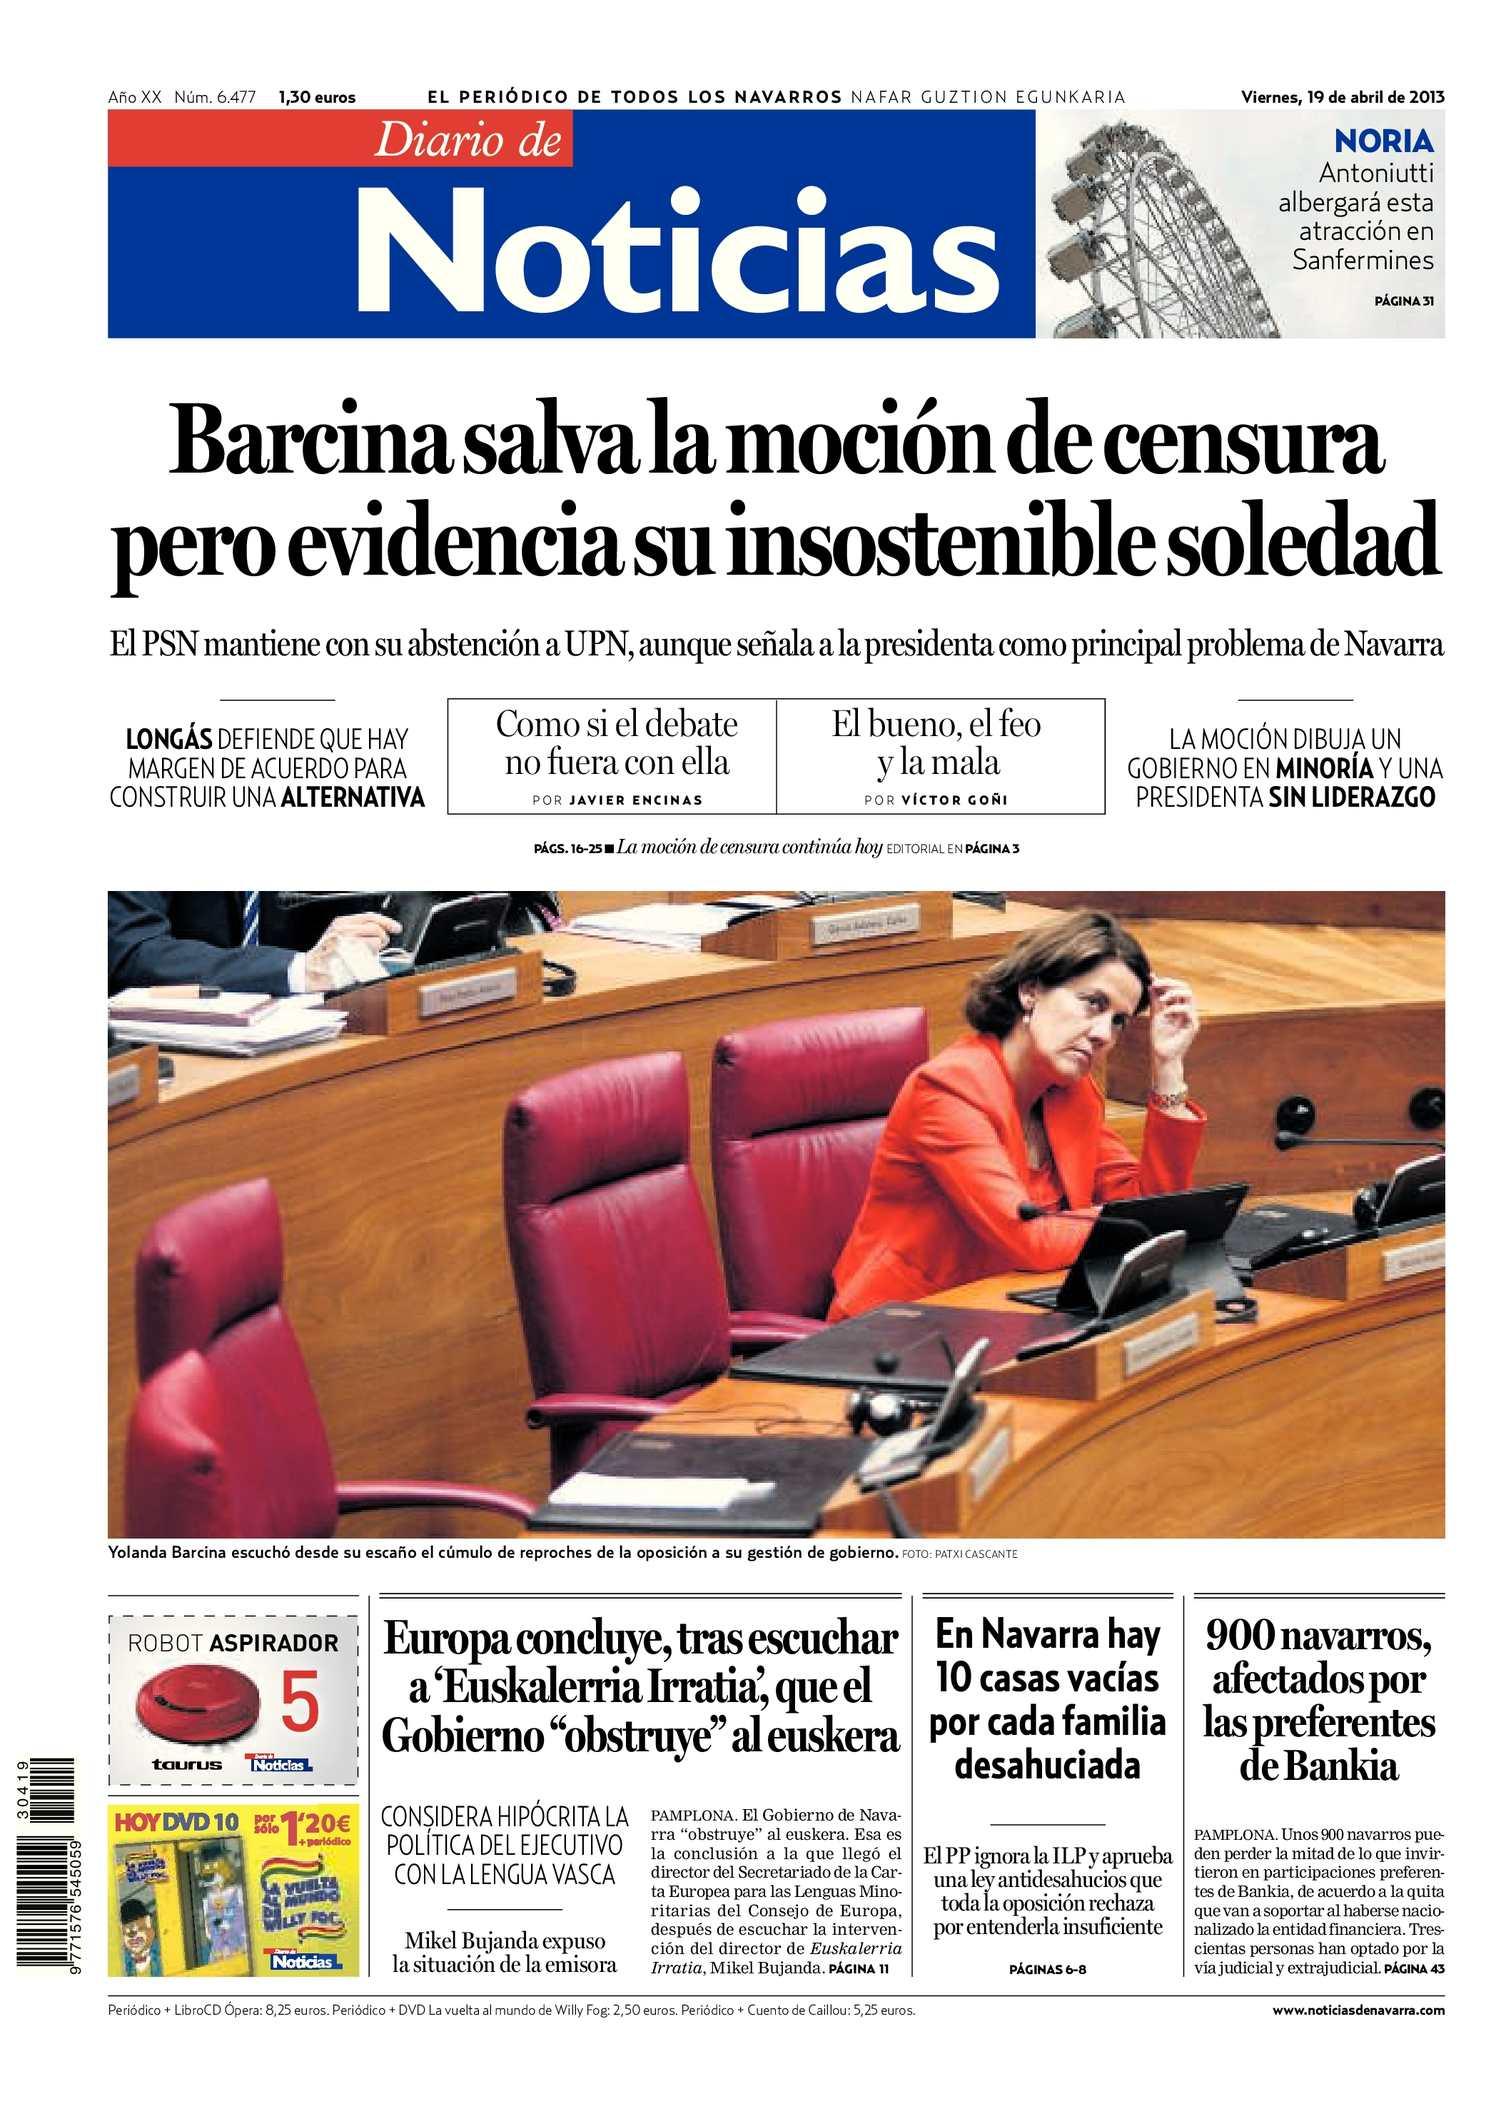 Calaméo - Diario de Noticias 20130419 27437c9ca869